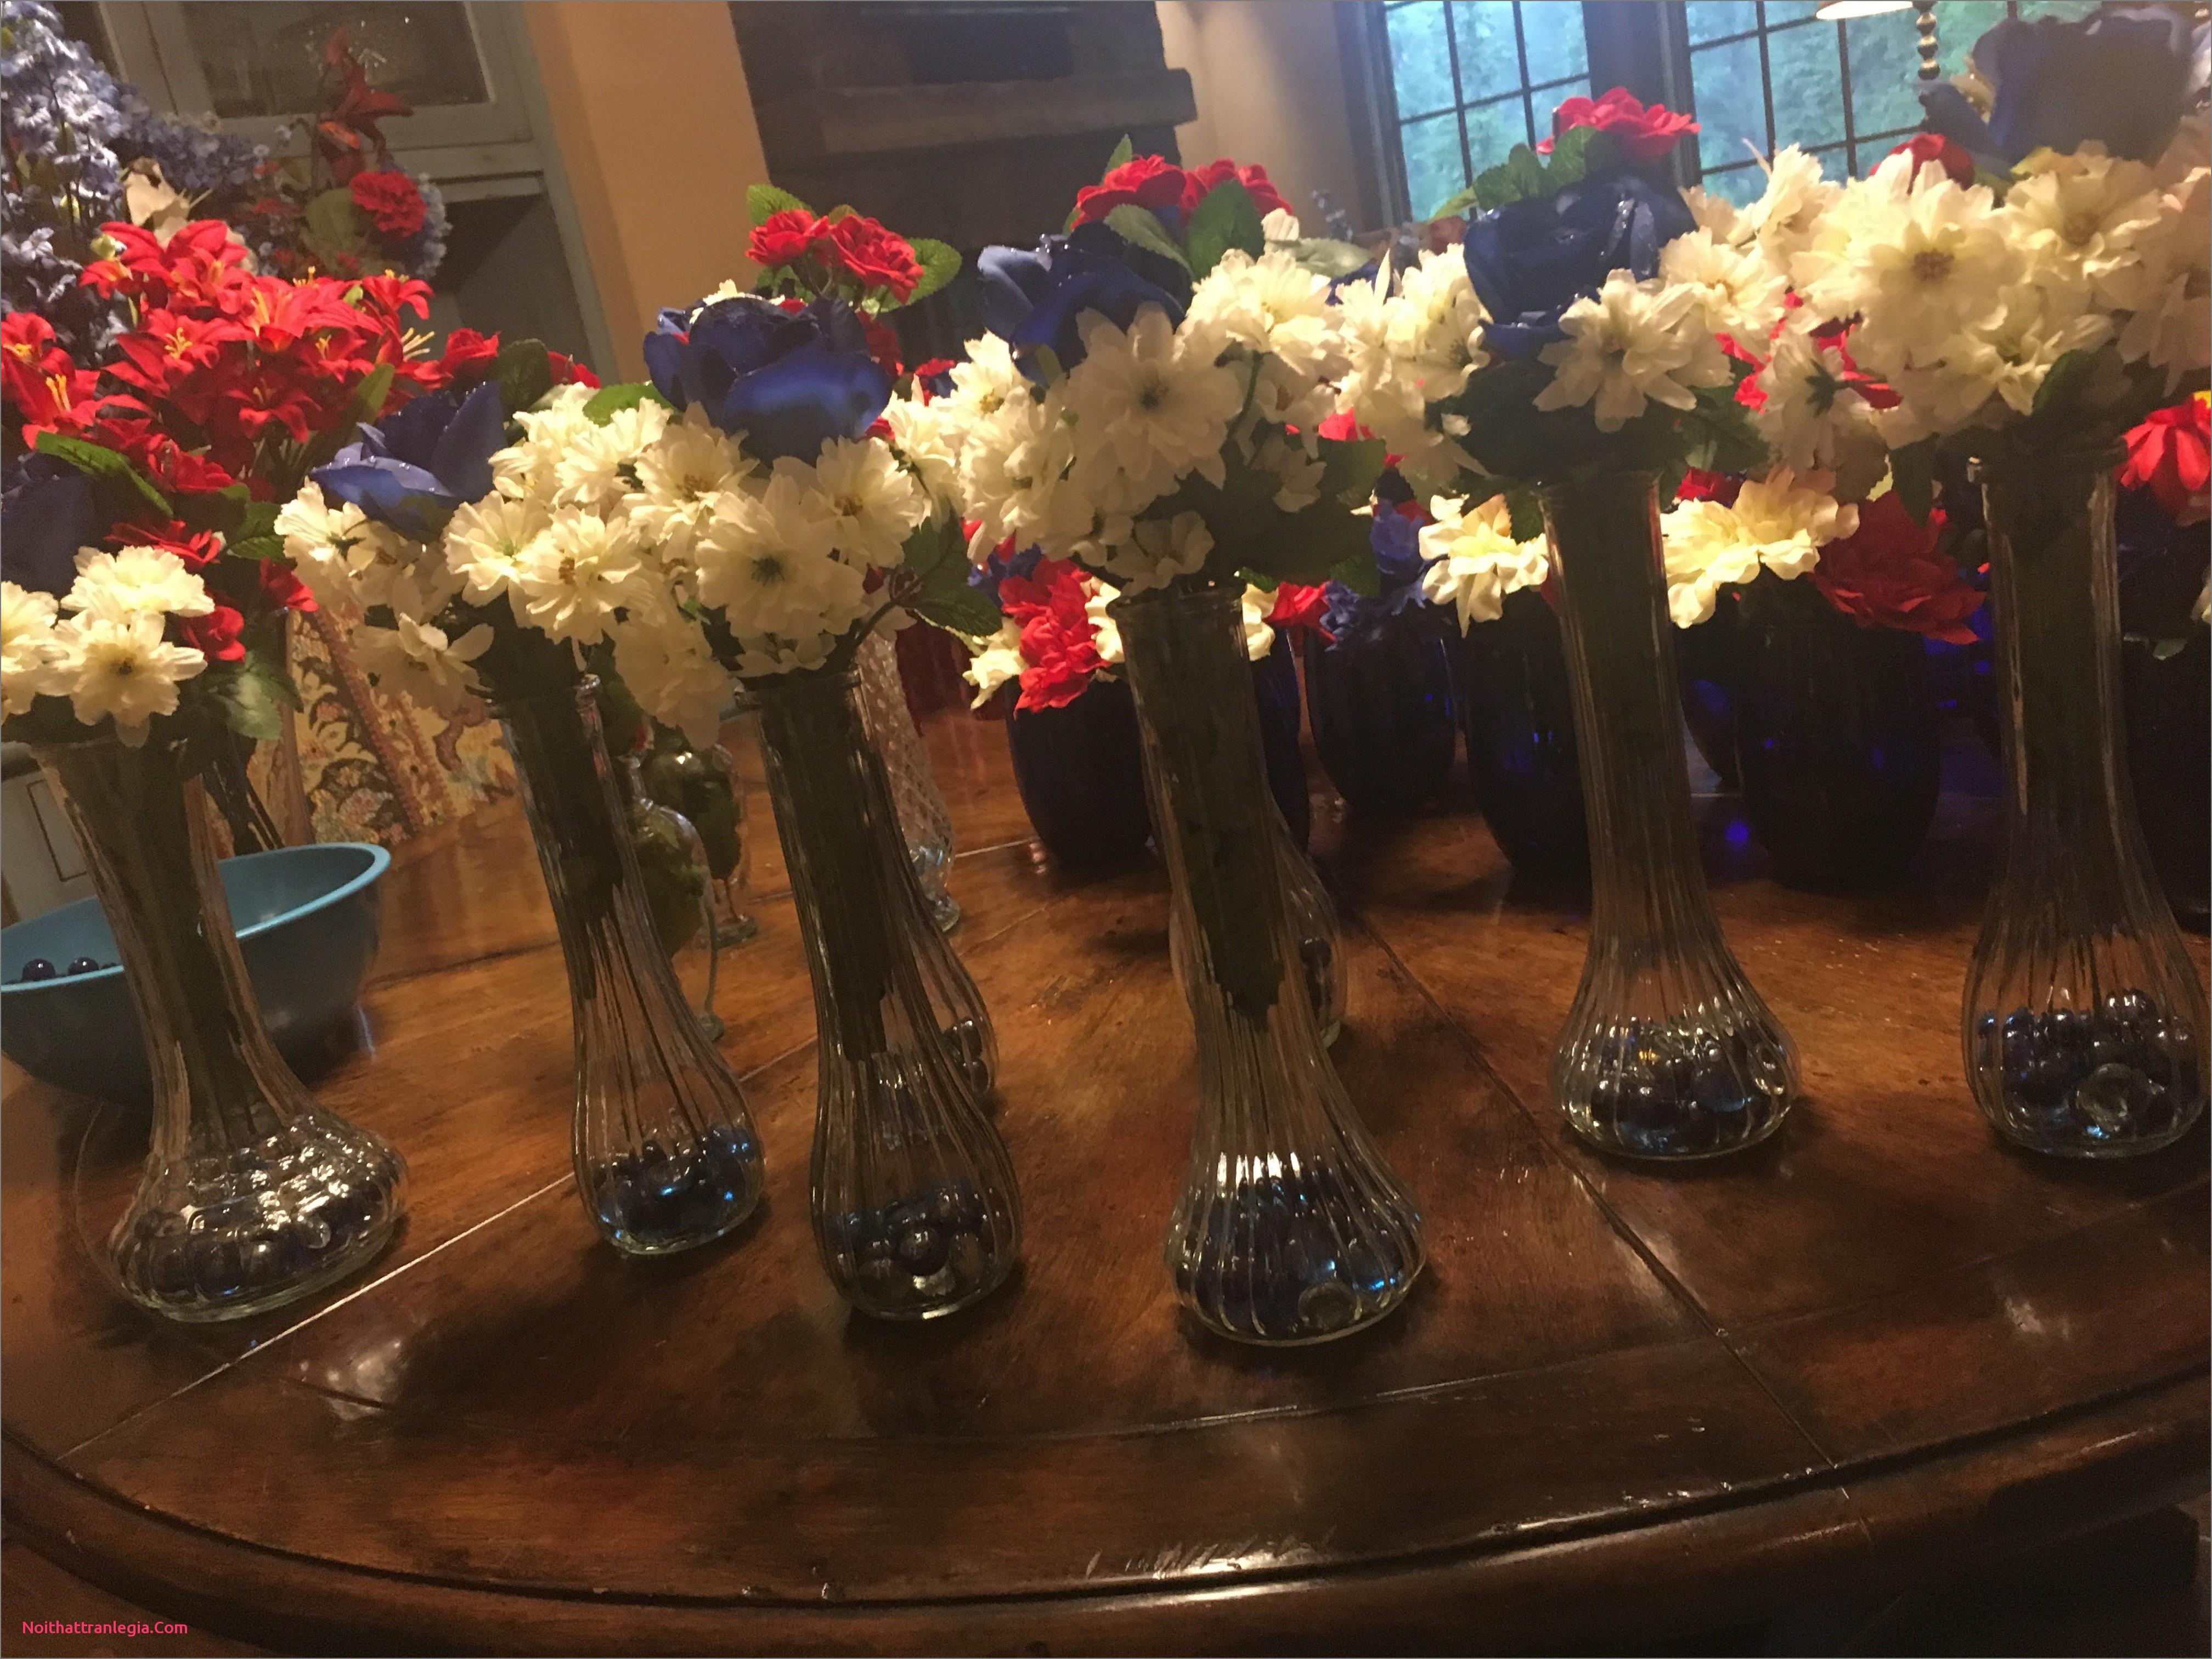 decorative floor vases of 20 wedding vases noithattranlegia vases design regarding decoration line luxury dollar tree wedding decorations awesome h vases dollar vase i 0d